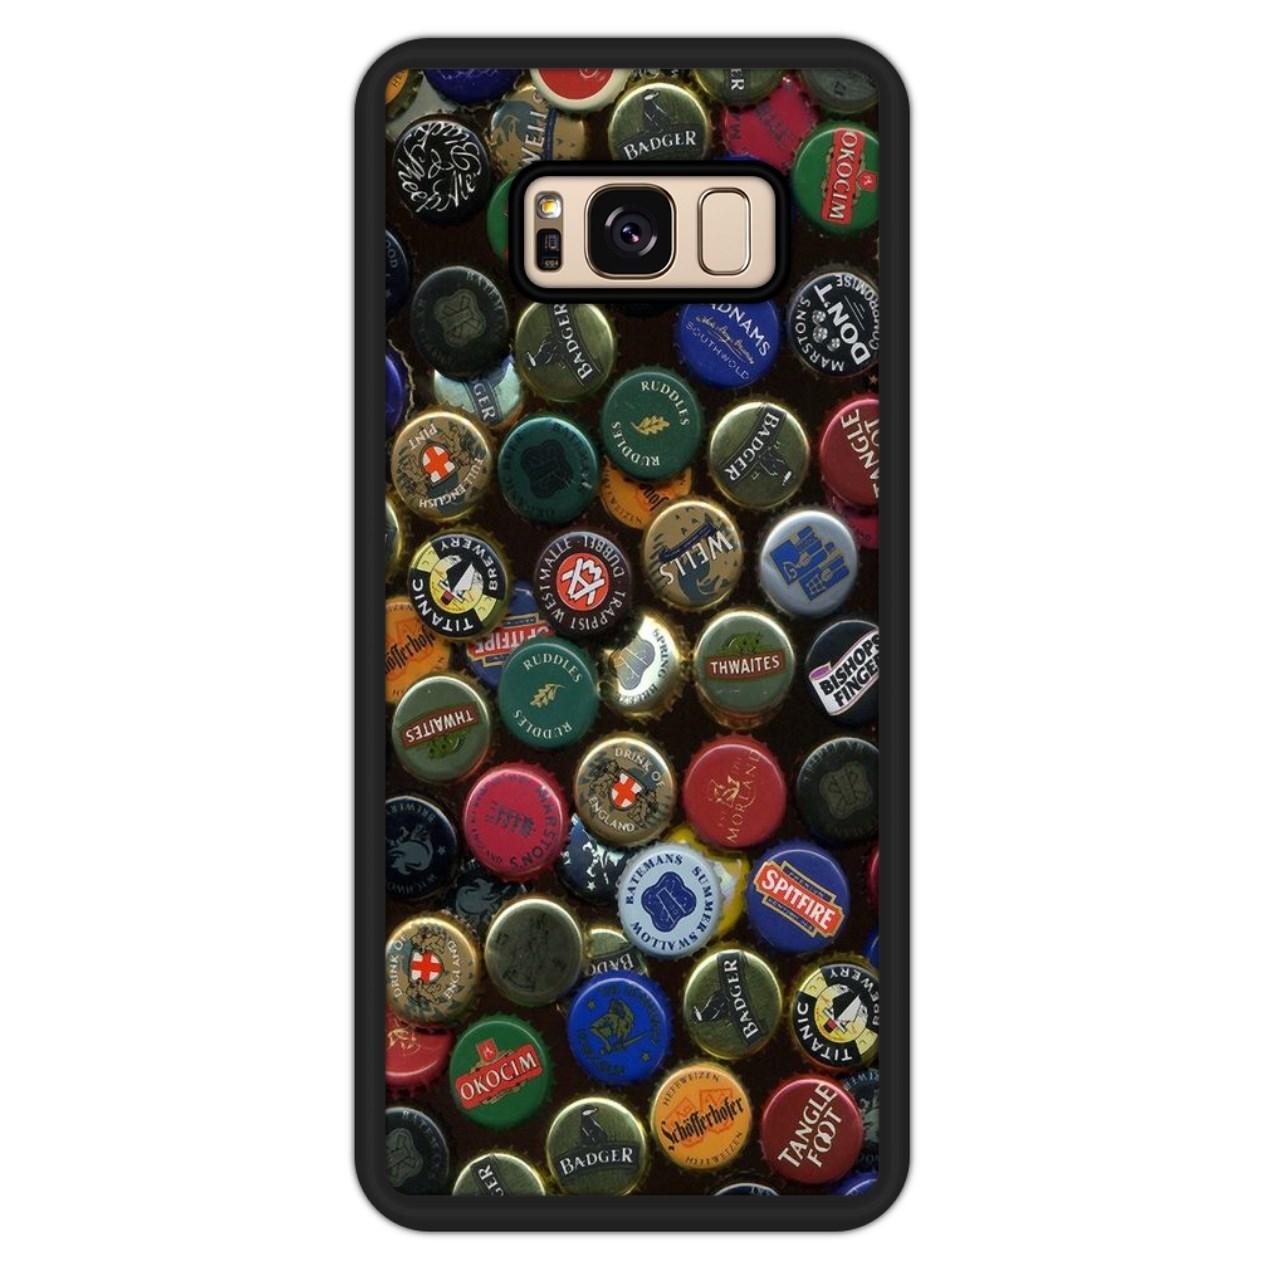 کاور آکام مدل AS8P0181  مناسب برای گوشی موبایل سامسونگ گلکسی اس 8 پلاس